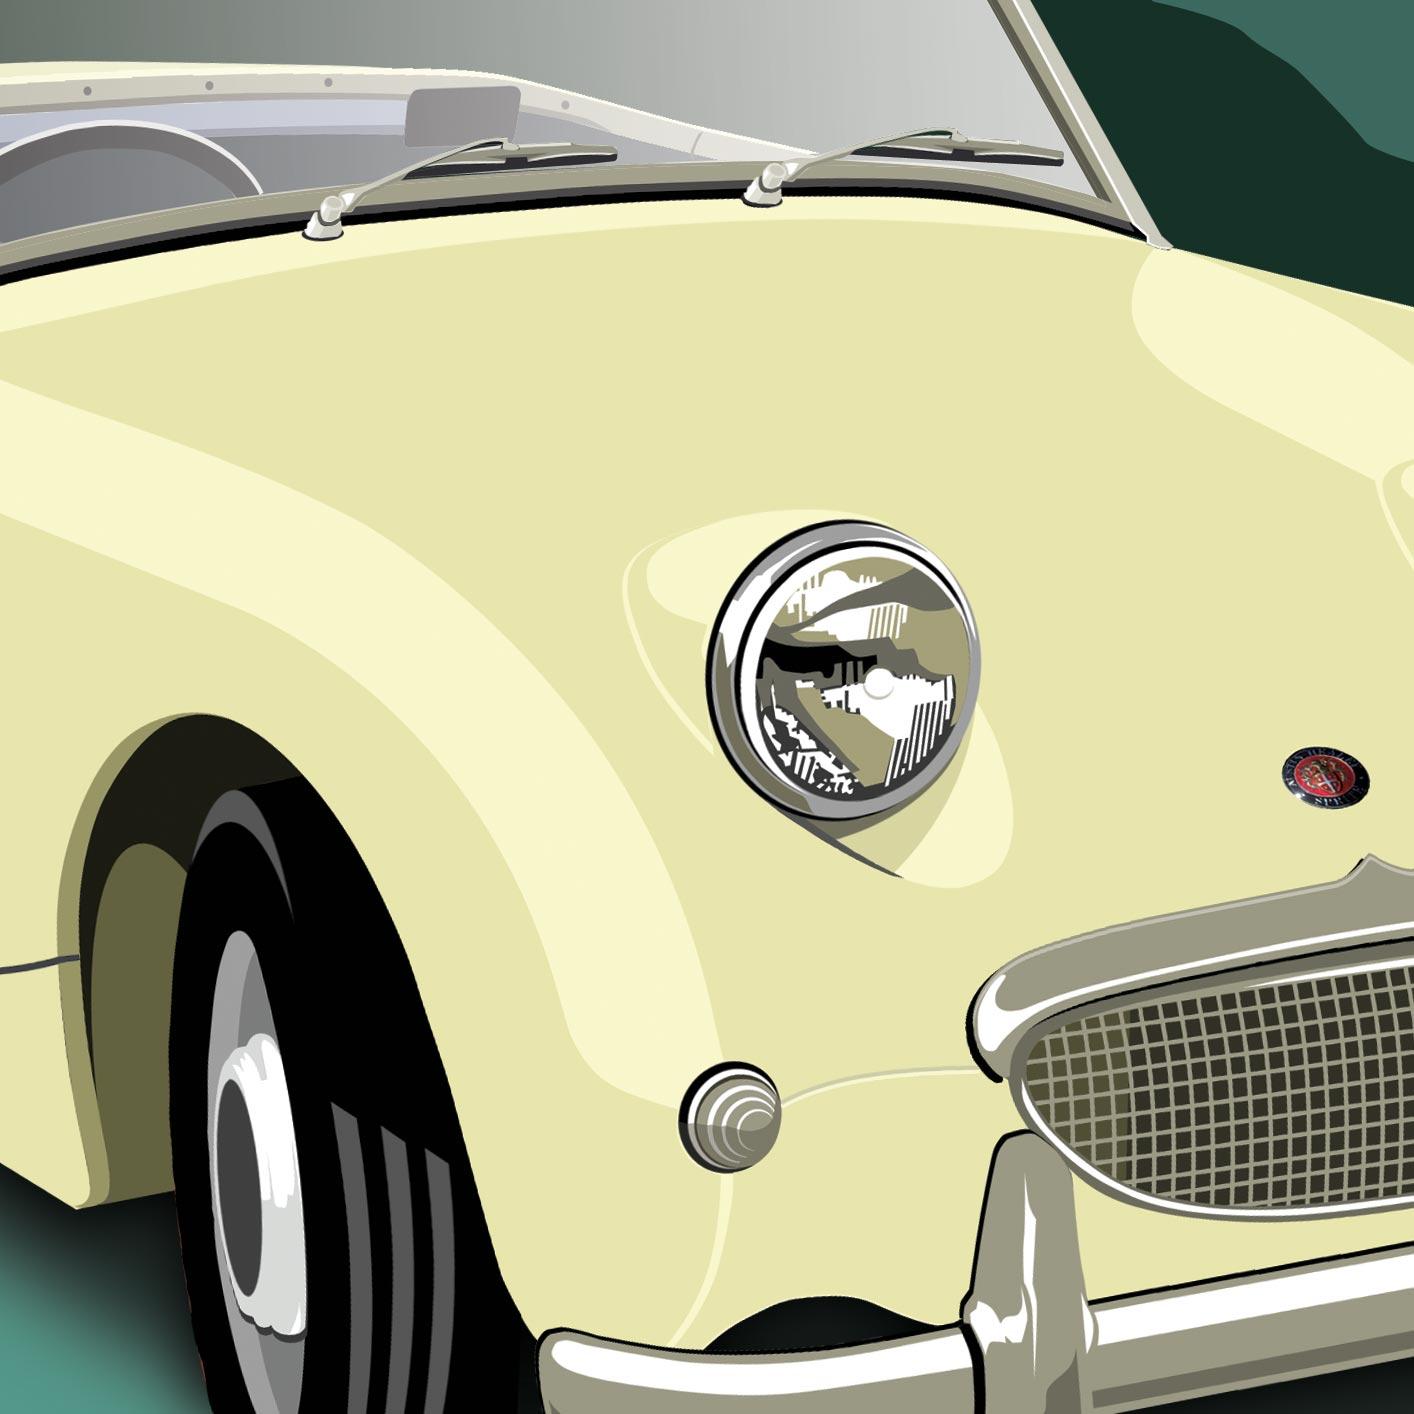 Austin Healey Sprite Car Illustration